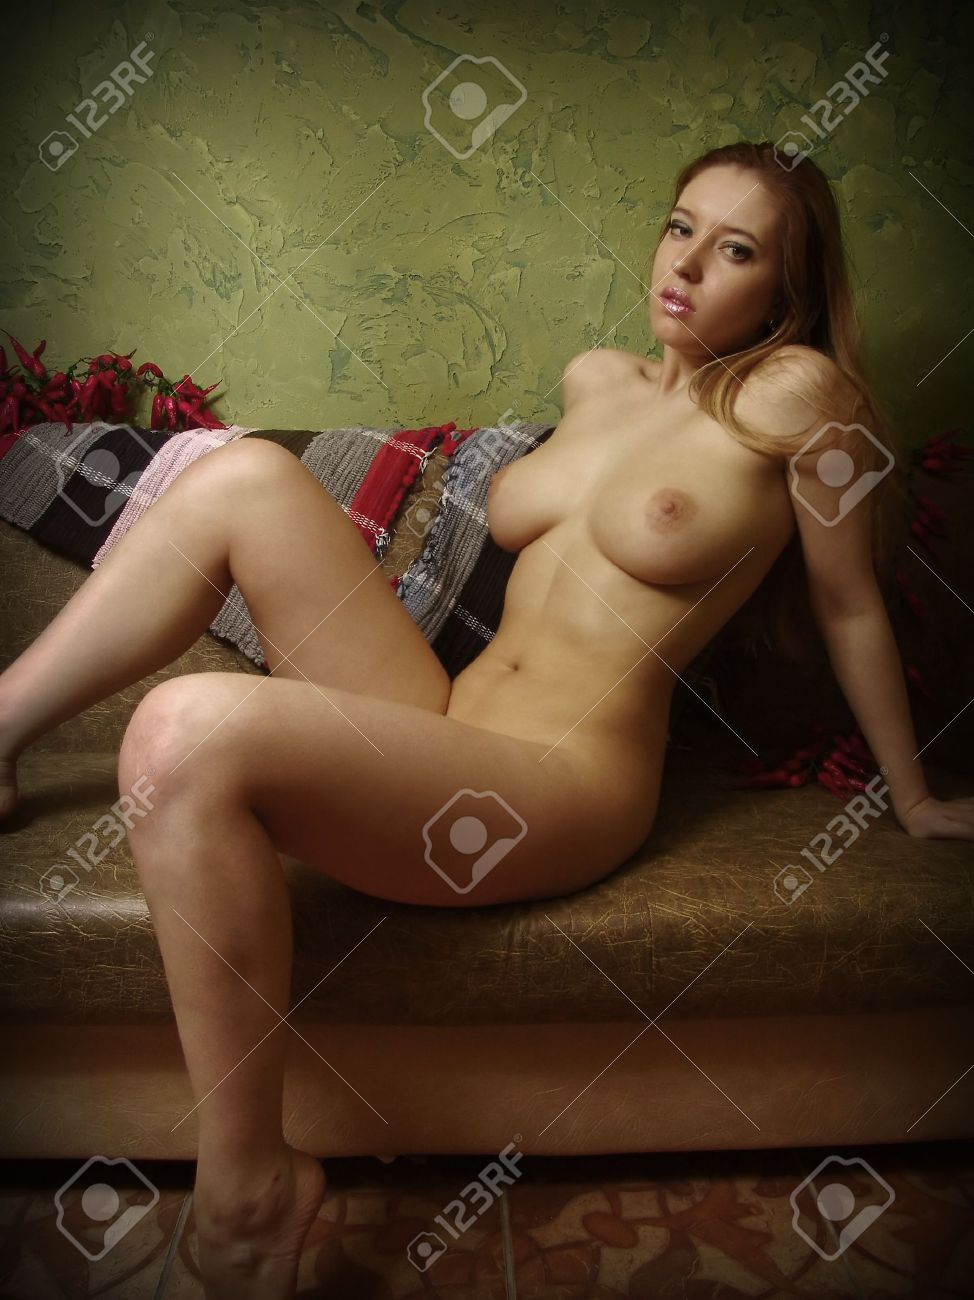 Chica desnuda sex, the erotic review pornstar board